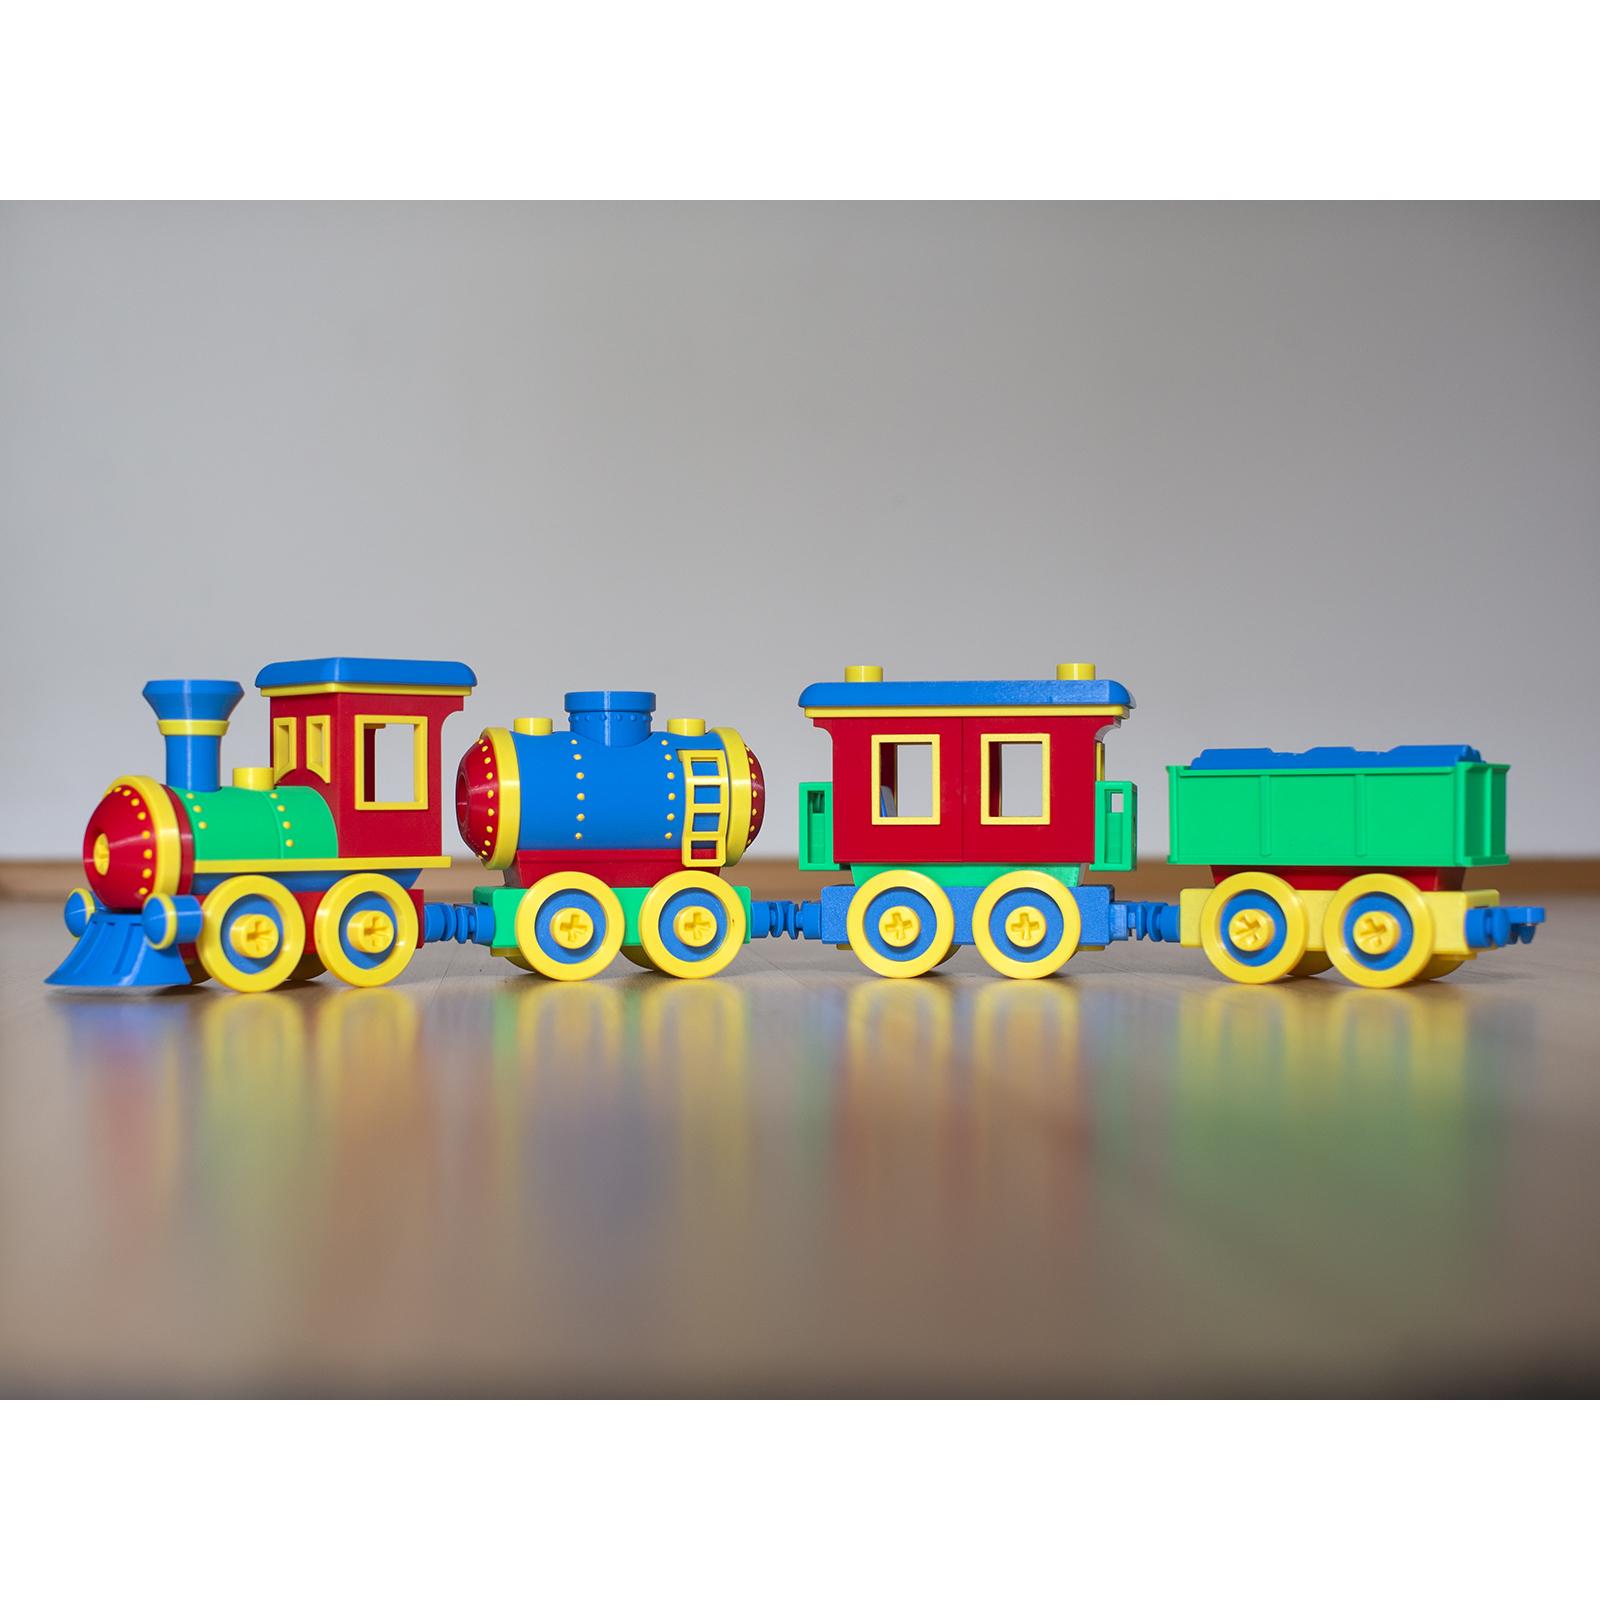 1.jpg Download STL file Toy train construction set - whole train combo • 3D print object, kozakm